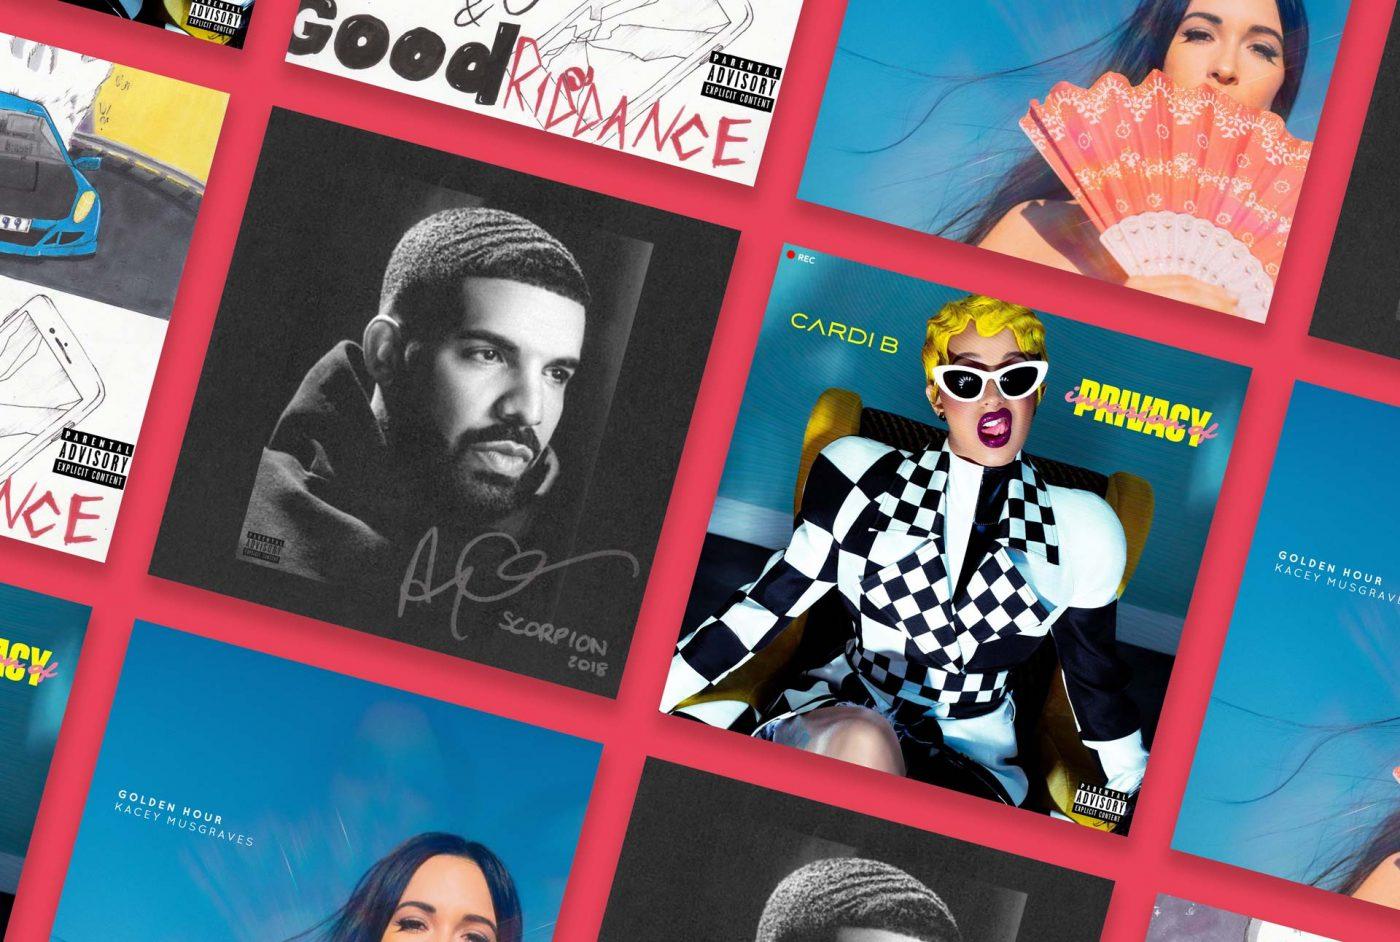 Apple-presents-best-of-2018-Music-12032018